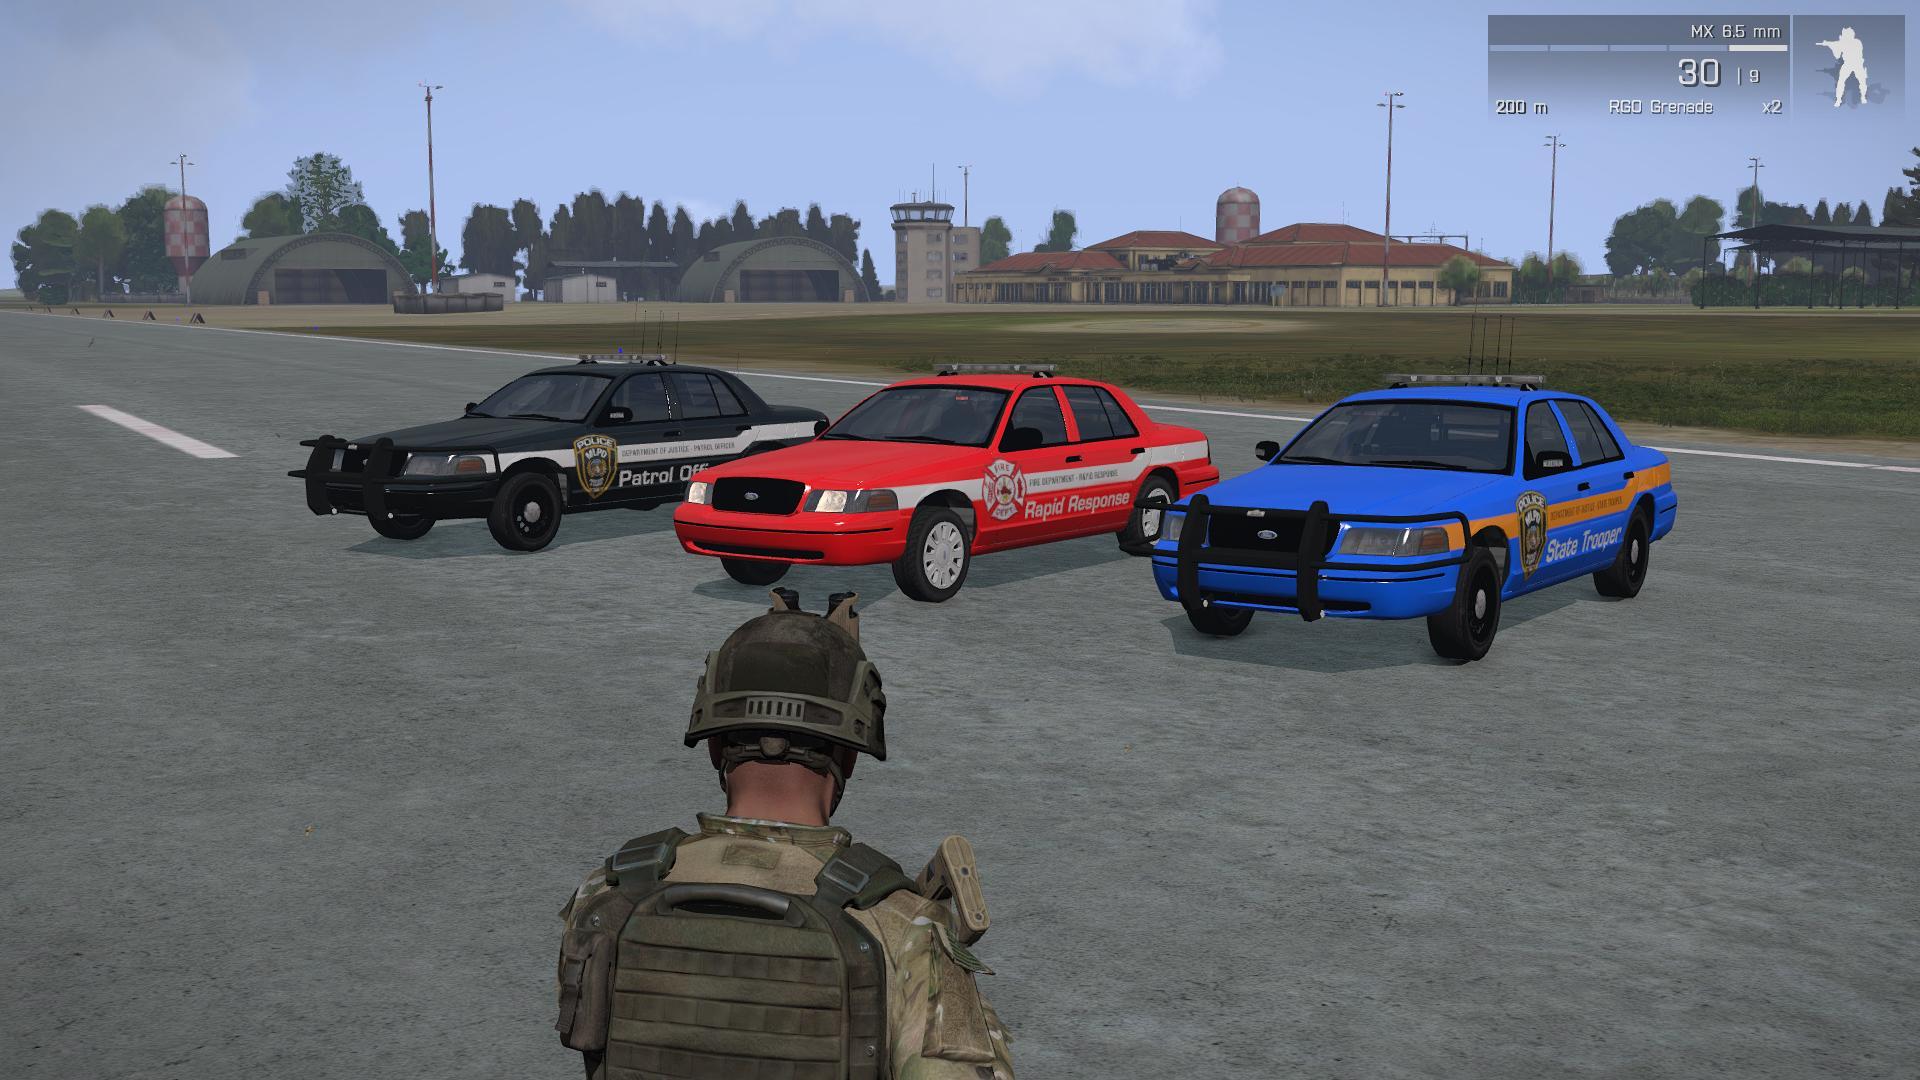 Some Emergency Vehicles! image - Mafia Life RPG mod for ARMA 3 - Mod DB